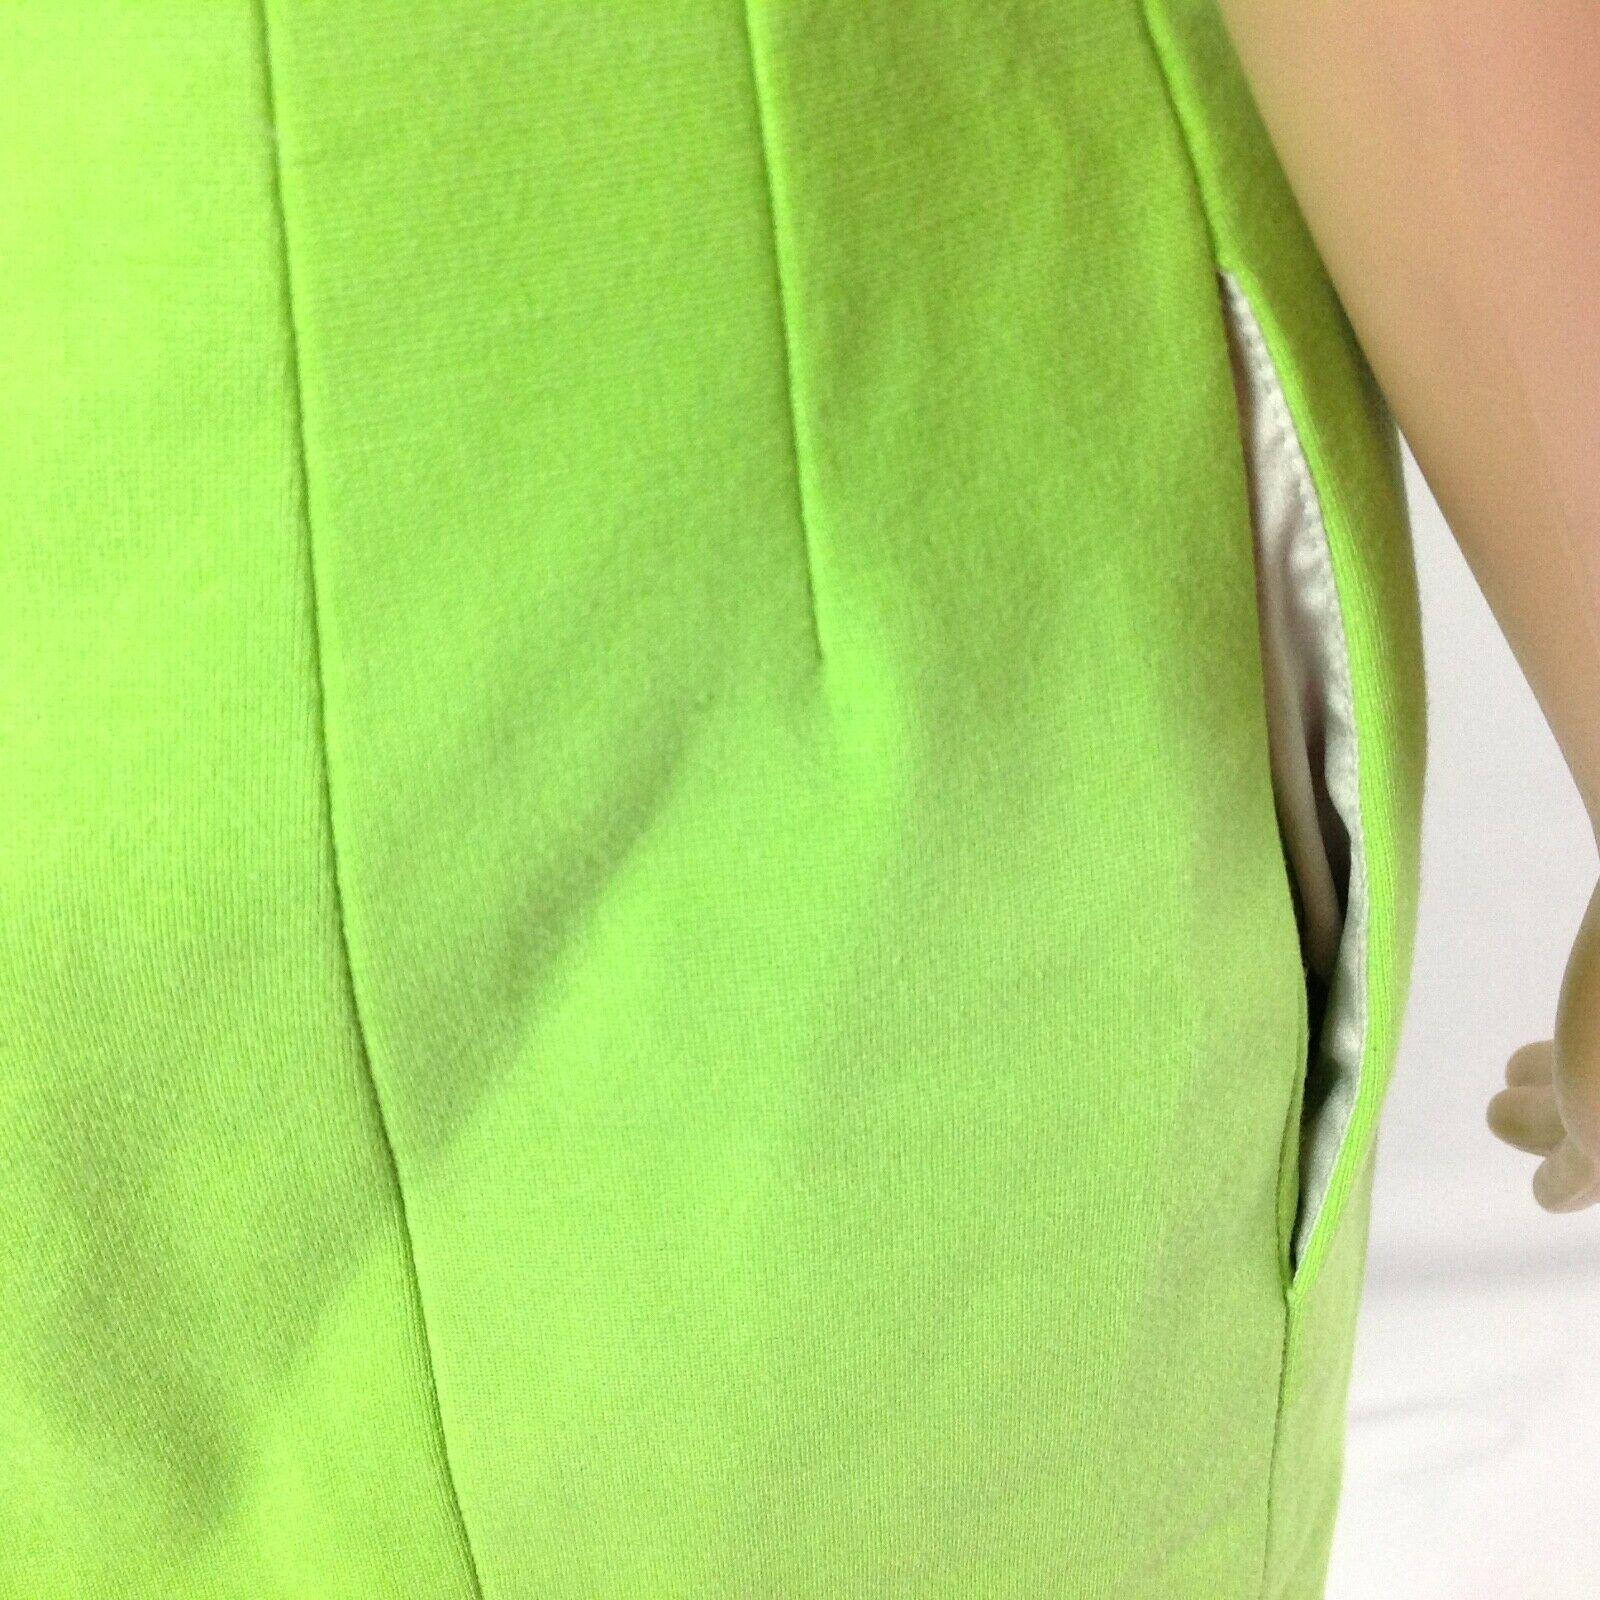 Diana von Furstenberg Agatha Knit Suiting Lime Gr… - image 6